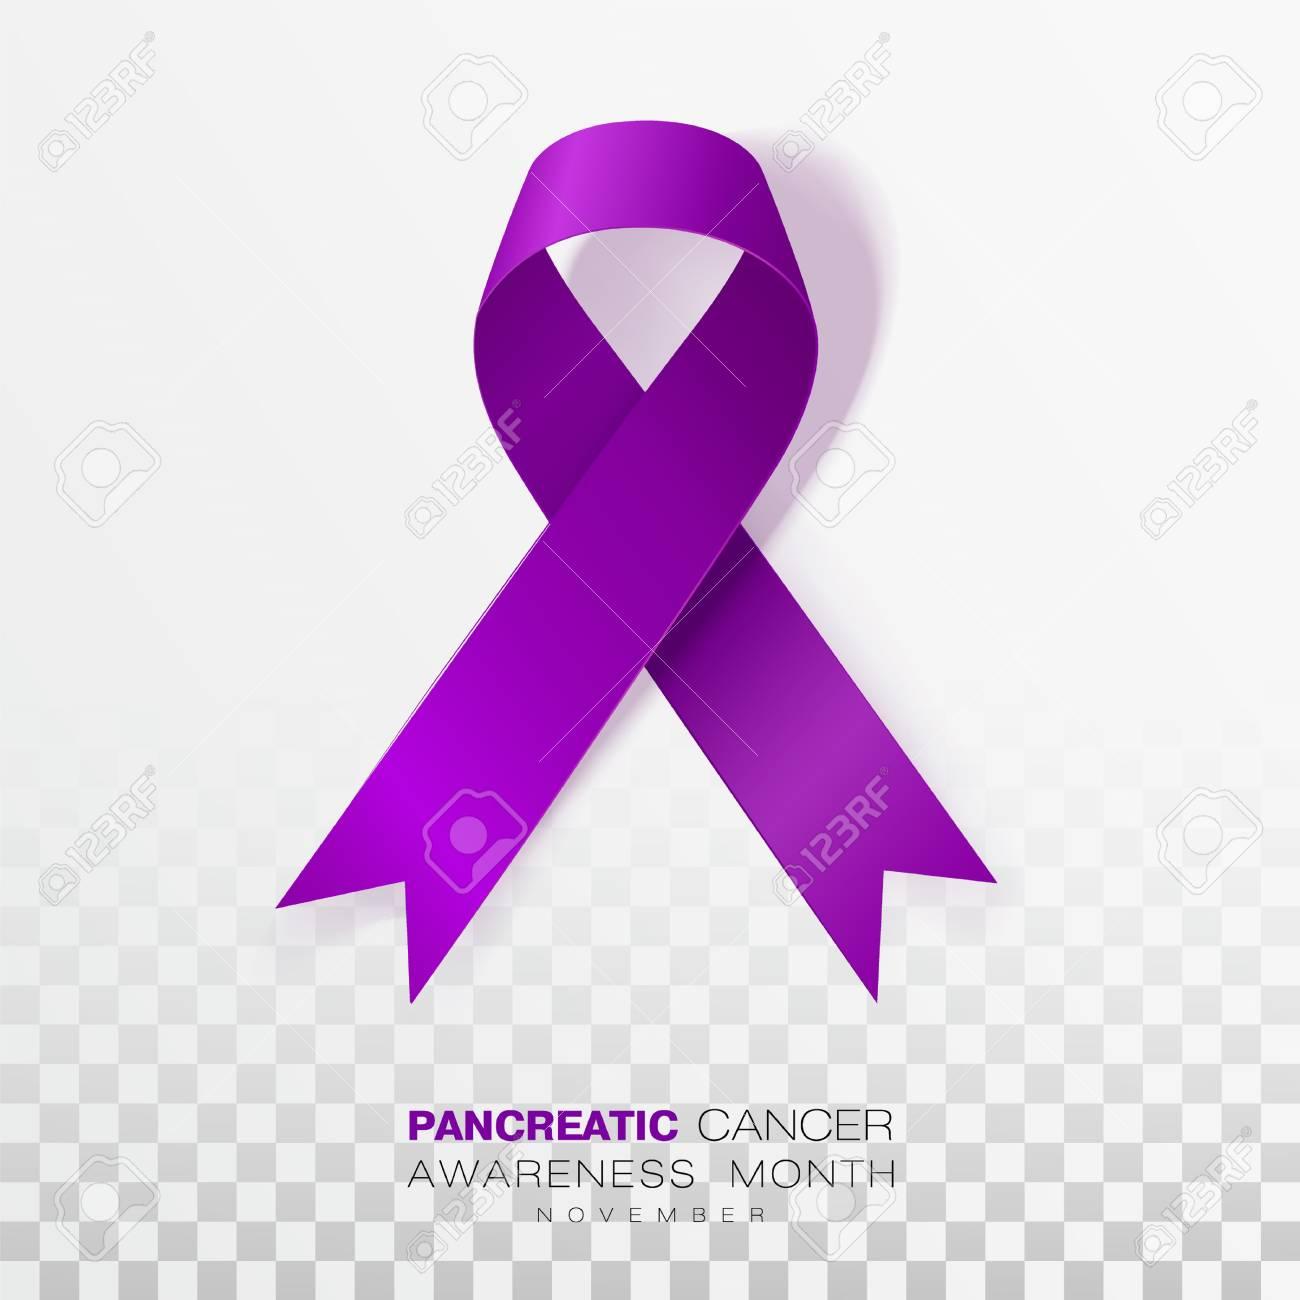 pancreatic cancer ribbon color